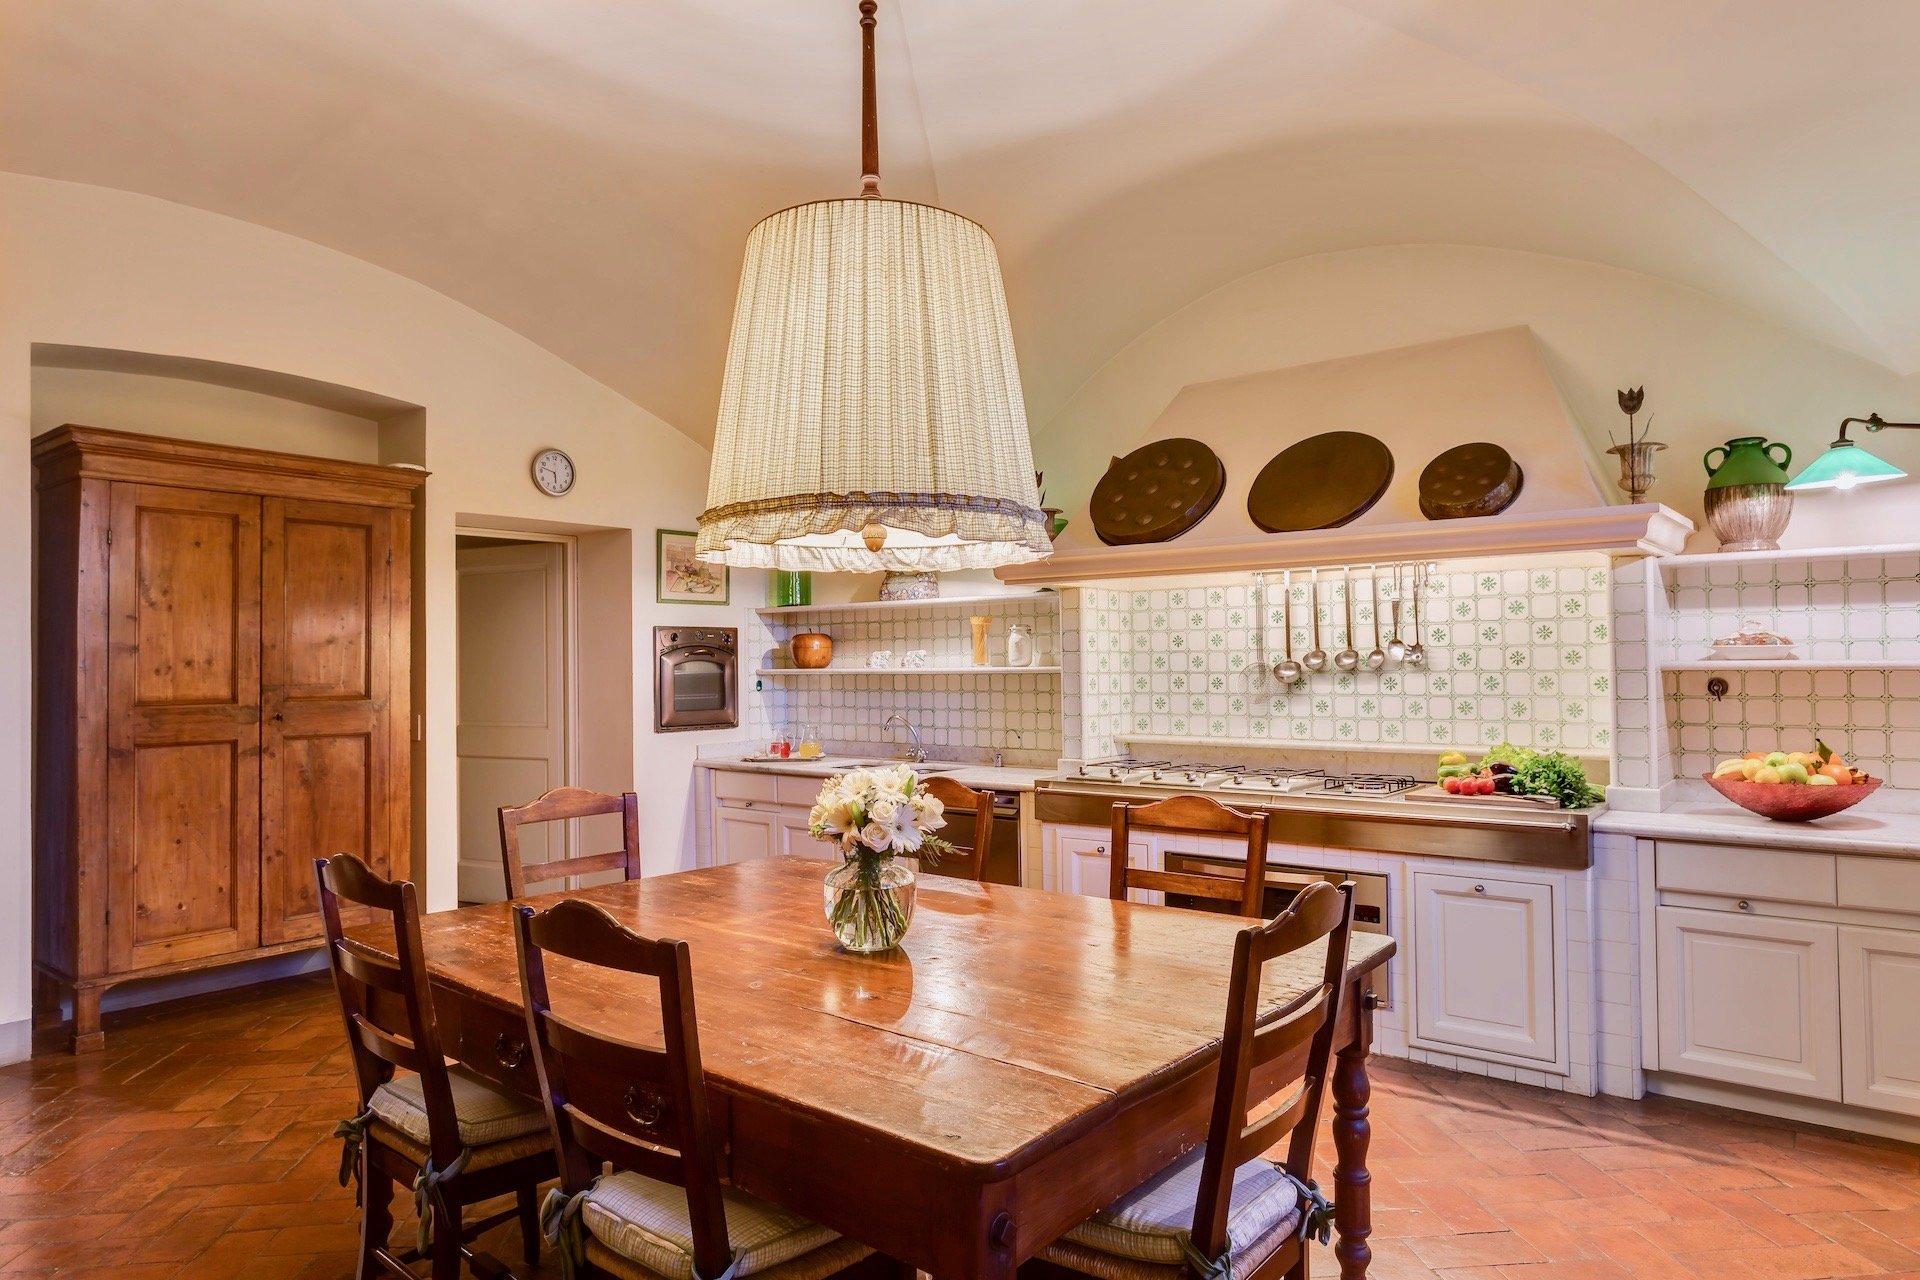 45.The Kitchen